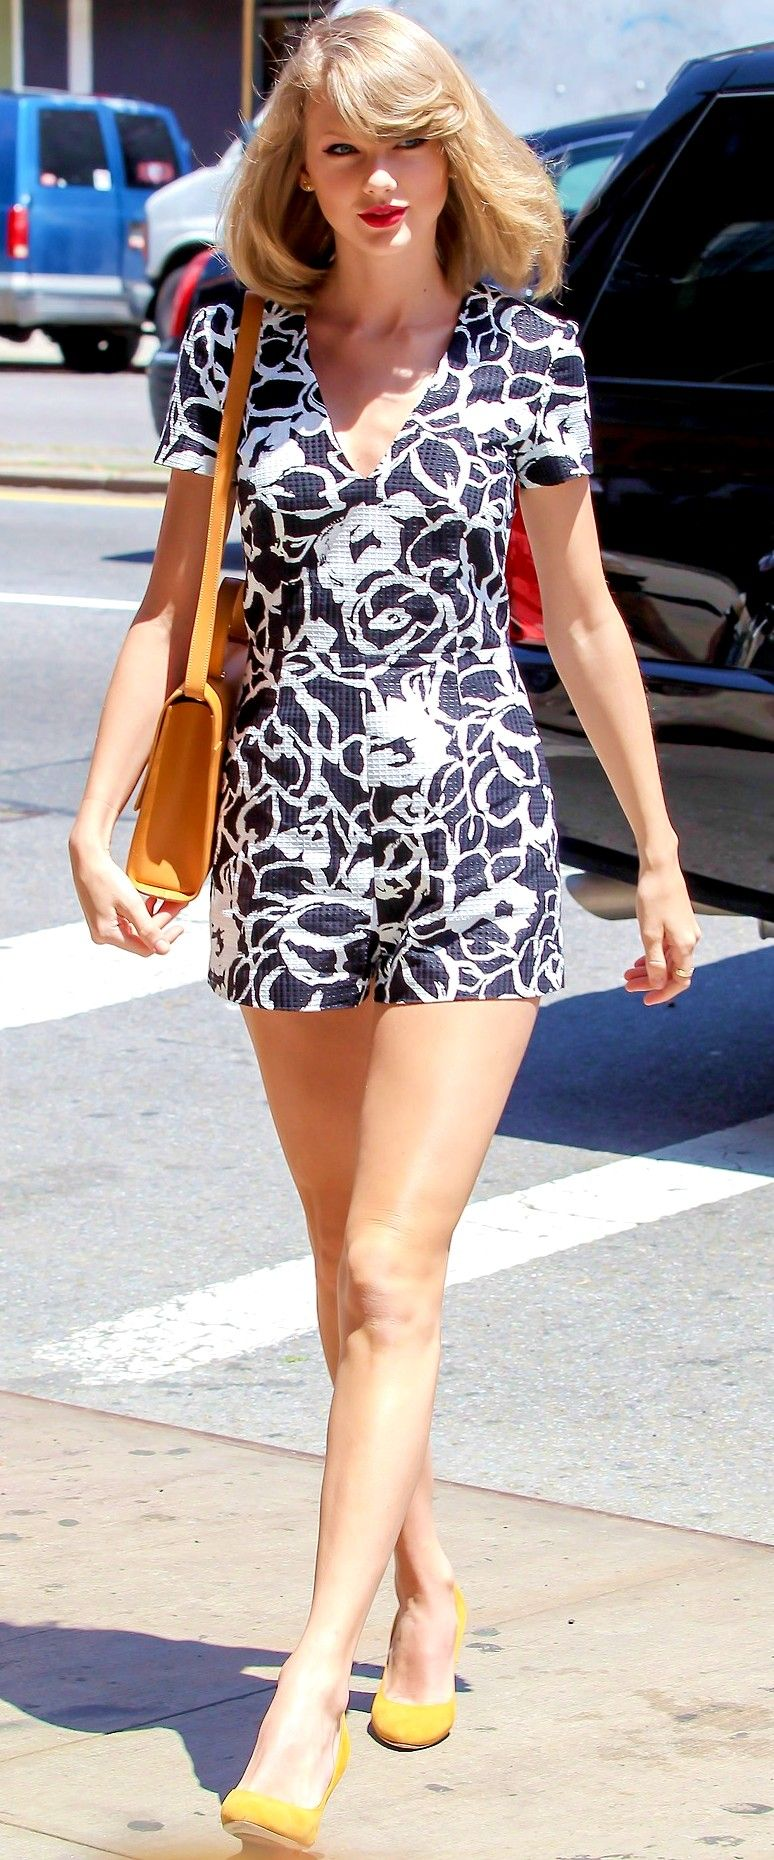 Taylor Swift - Shanghai Concert May 2014 | Just FAB Celebs |Taylor Swift May 2014